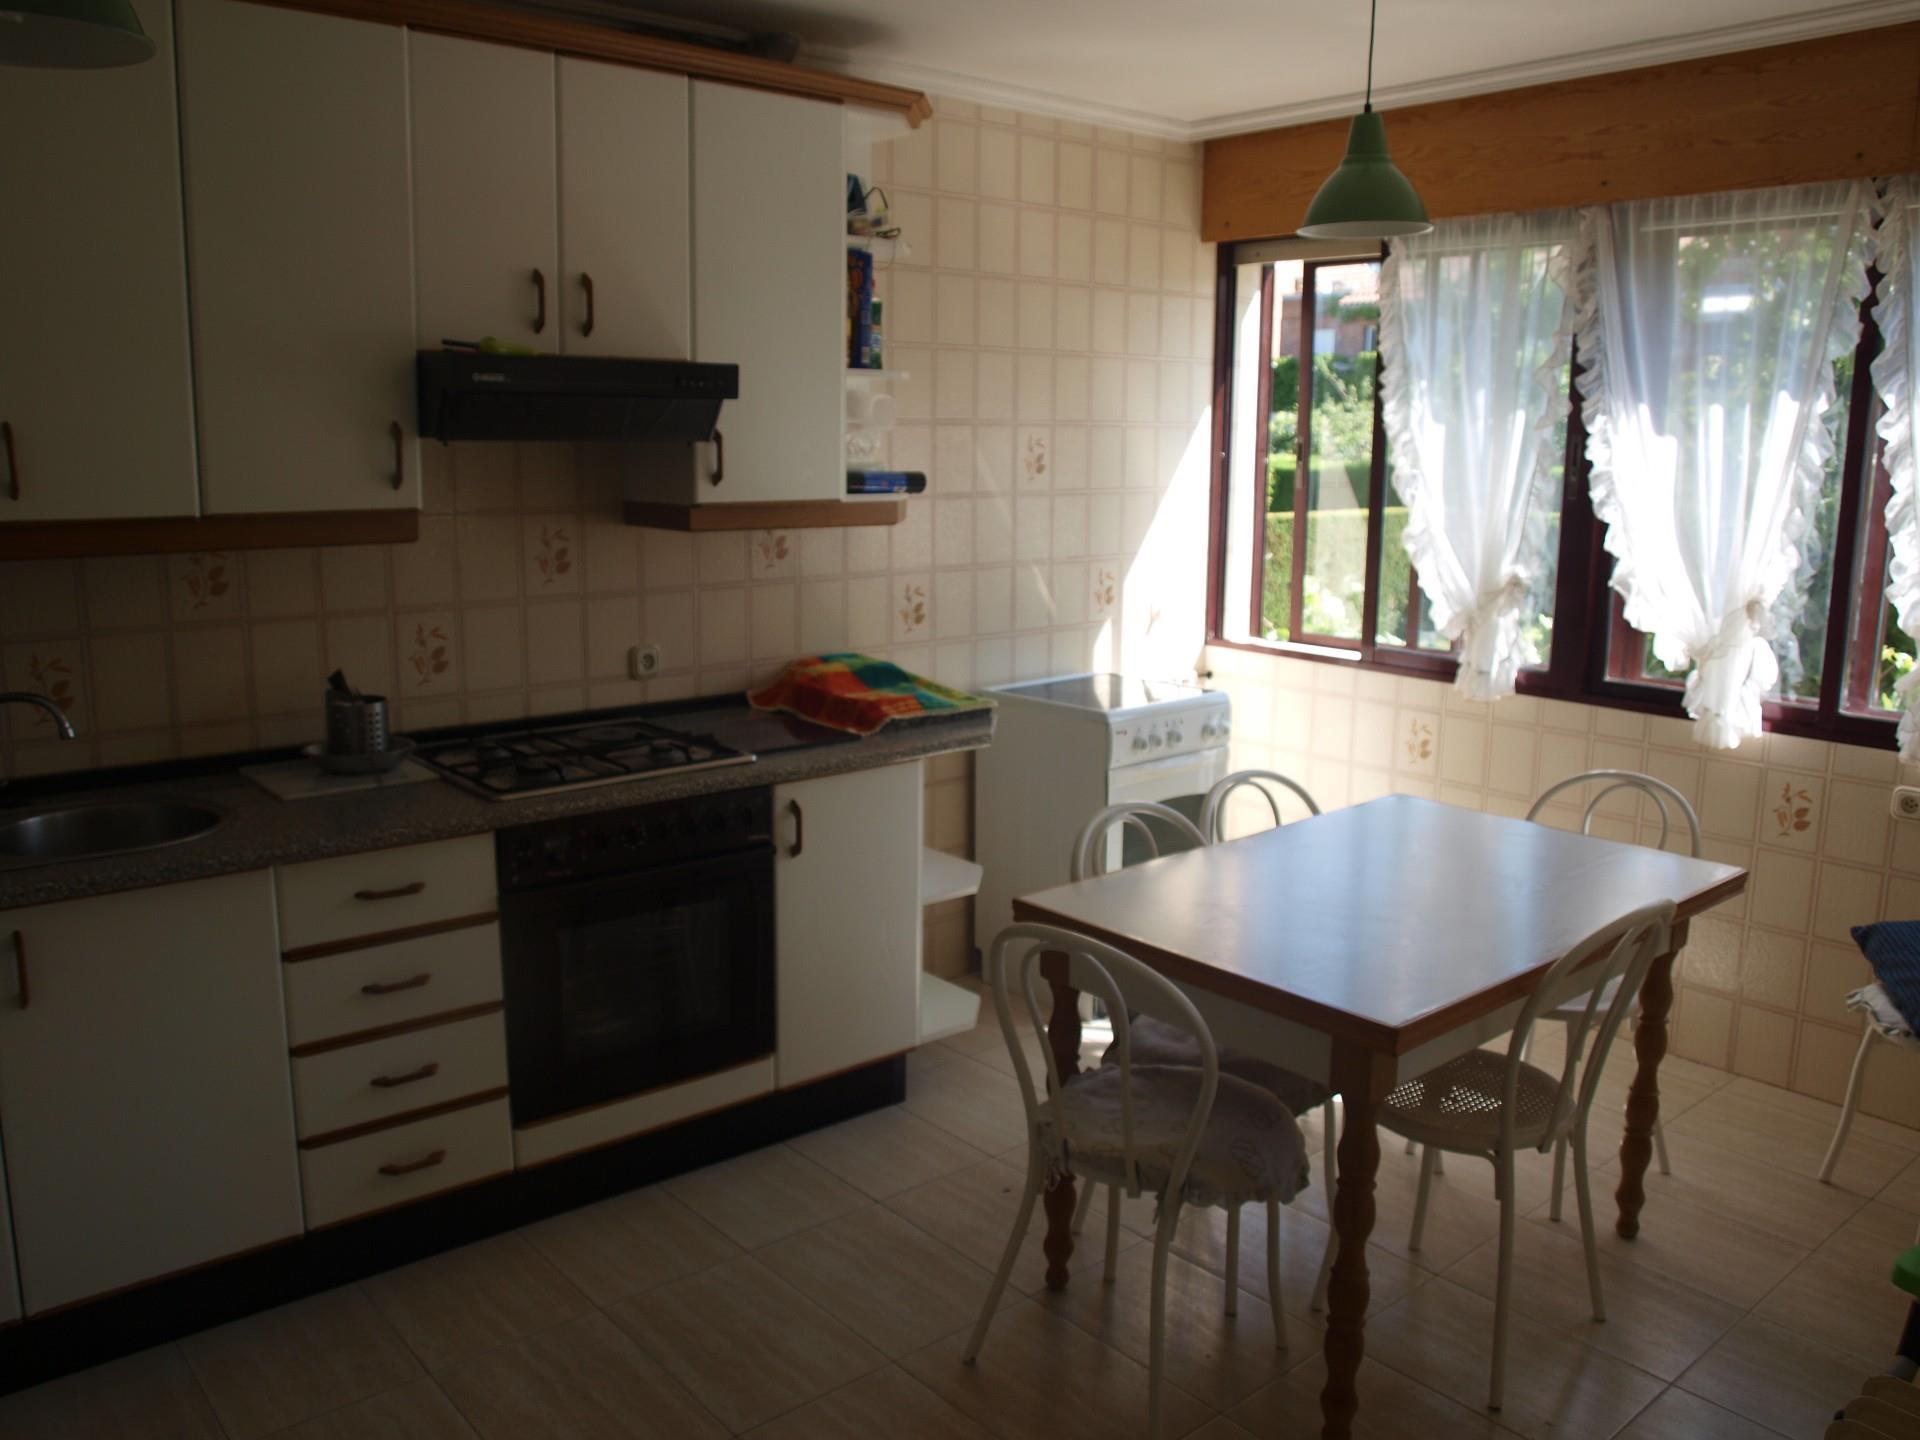 Casa o chalet de alquiler en Calle Arces, 35 Simancas (Simancas, Valladolid)